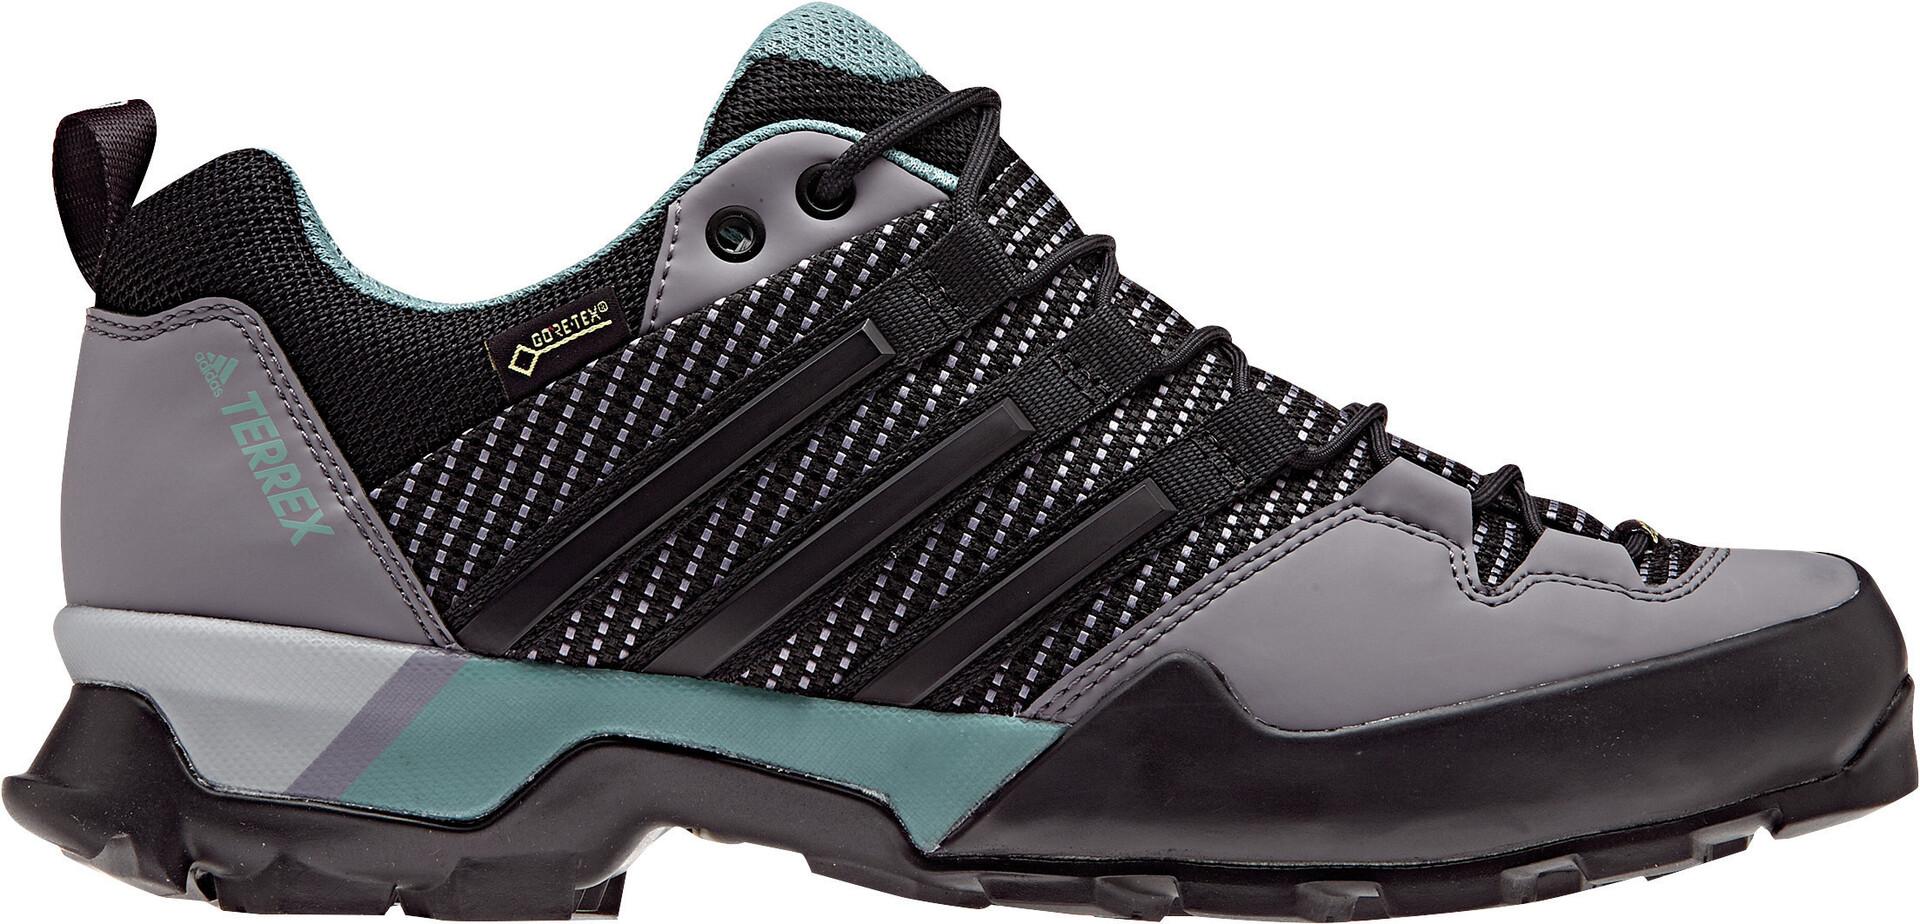 Grisnoir Sur Chaussures Femme Terrex Gtx Scope Campz Adidas 1PvqUx